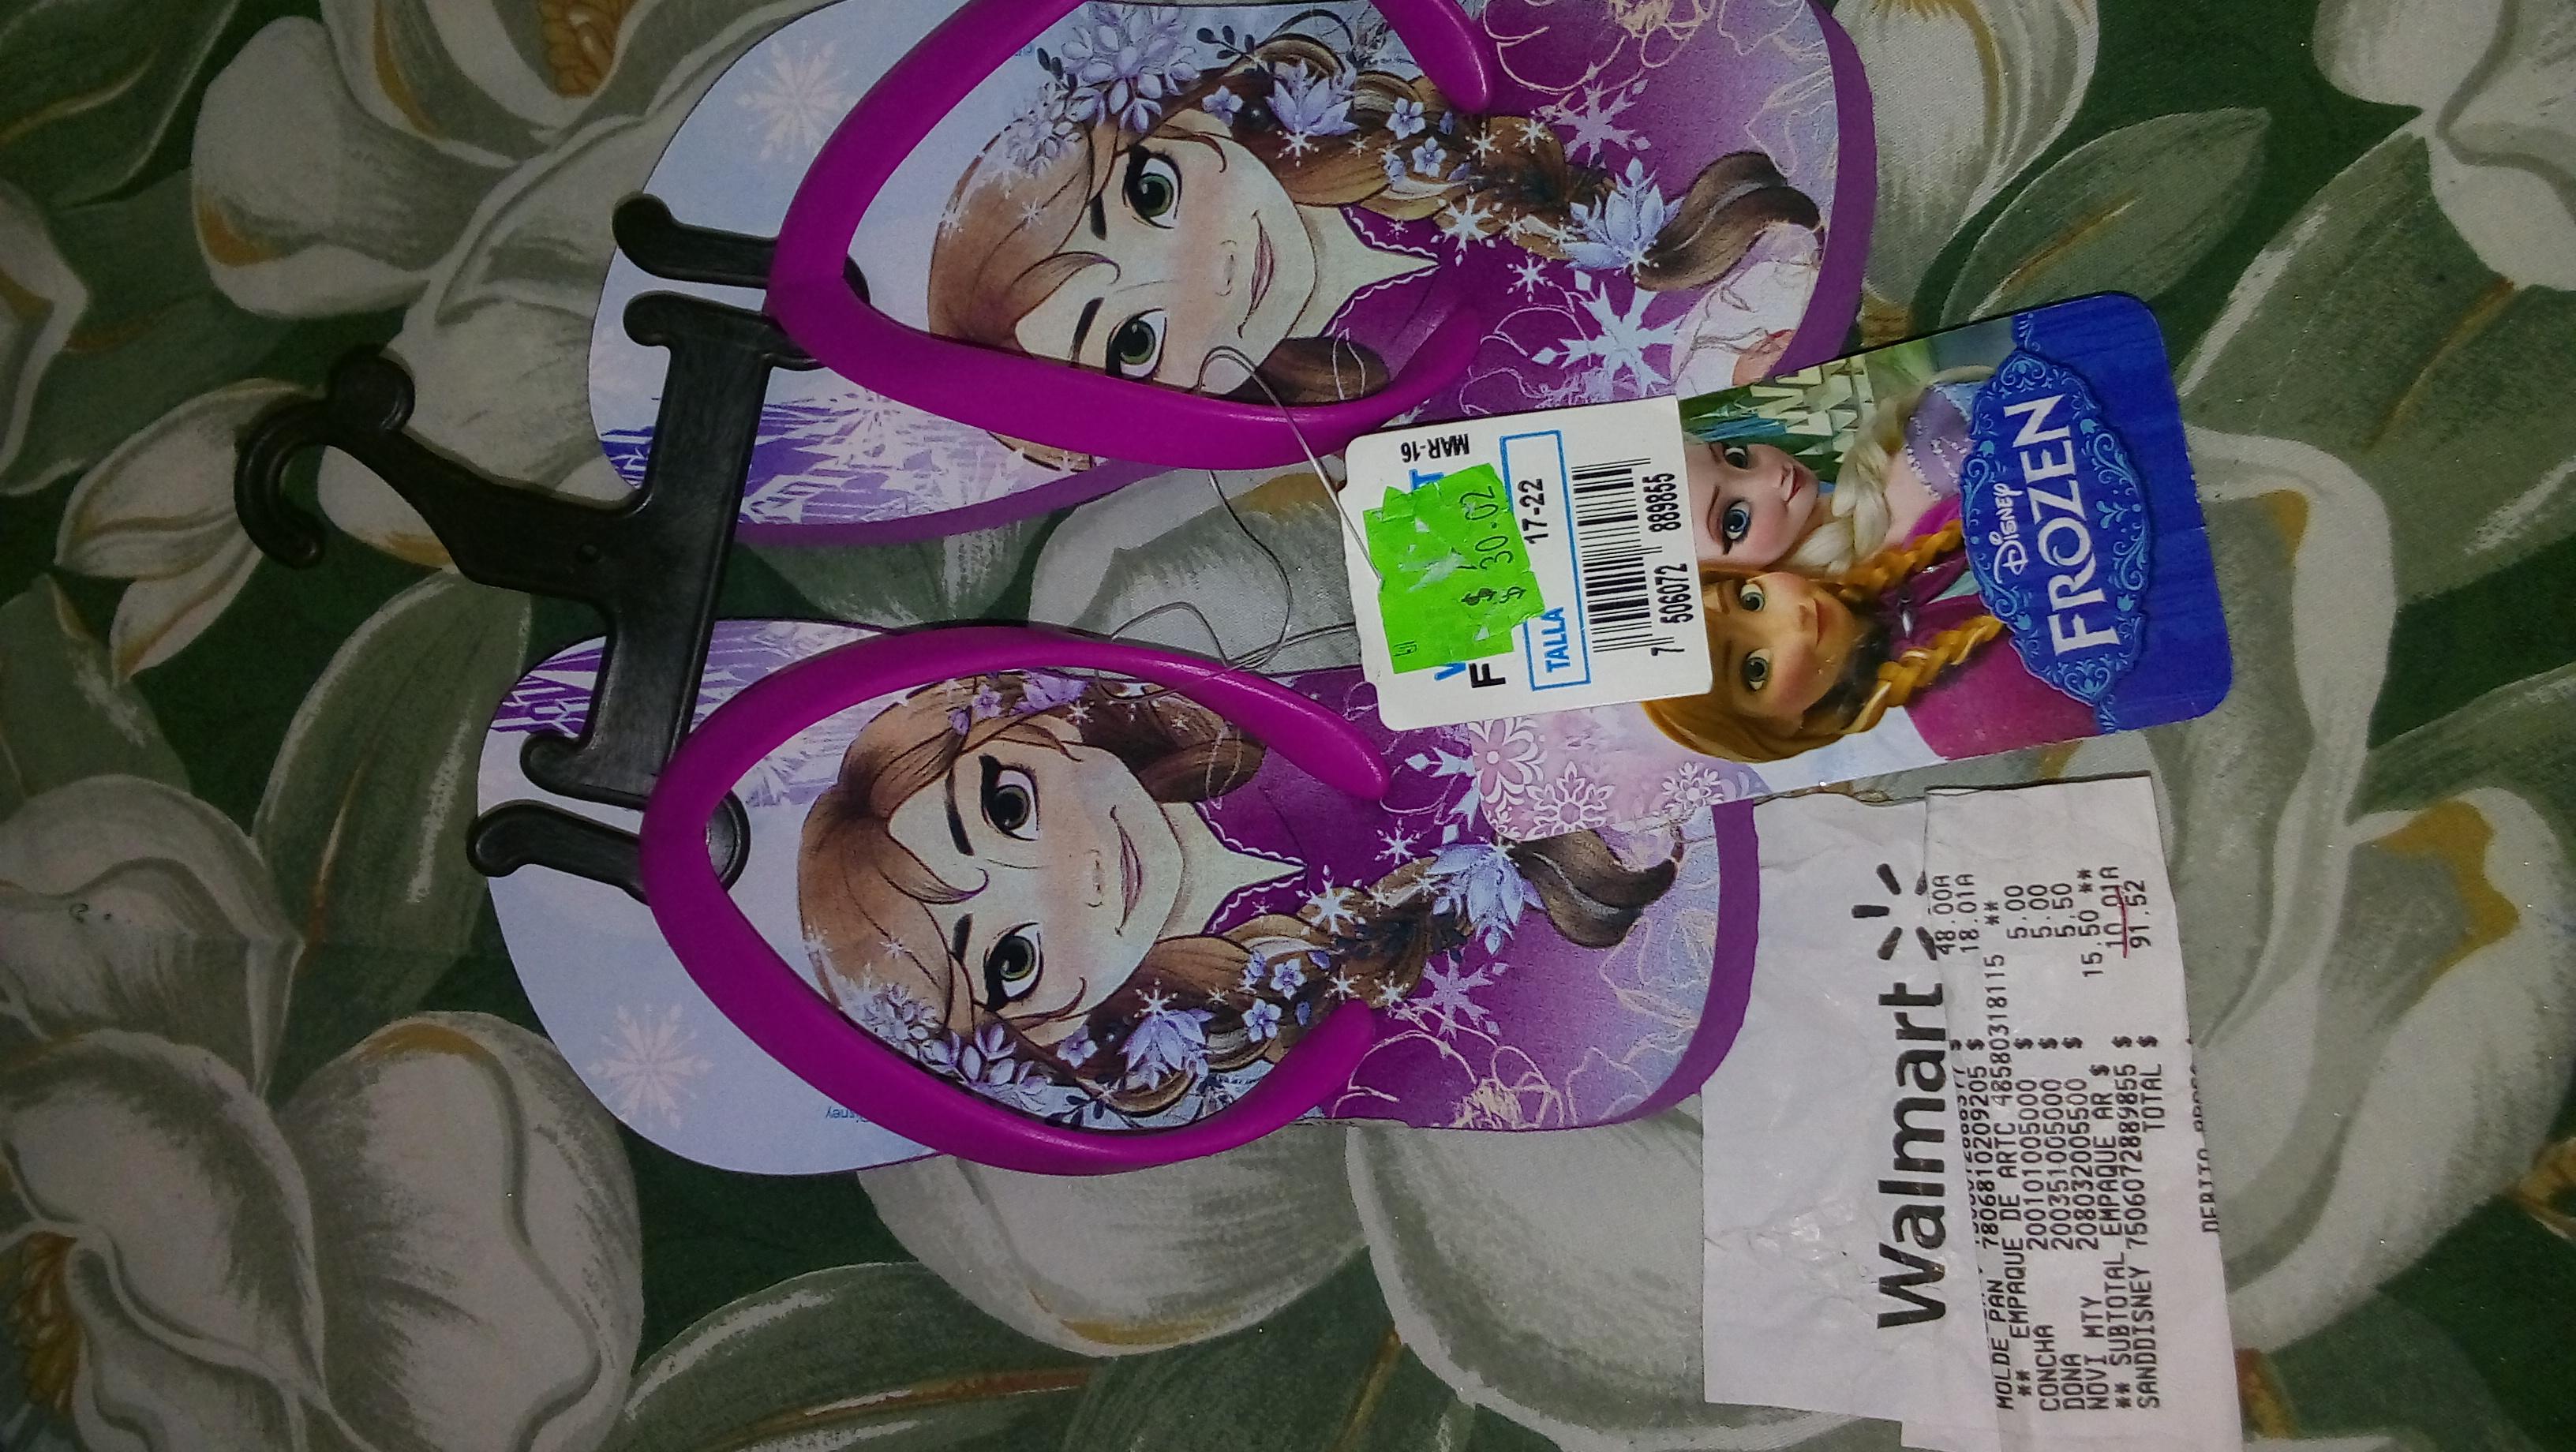 Walmart: Sandalias Disney Frozen a $10.01